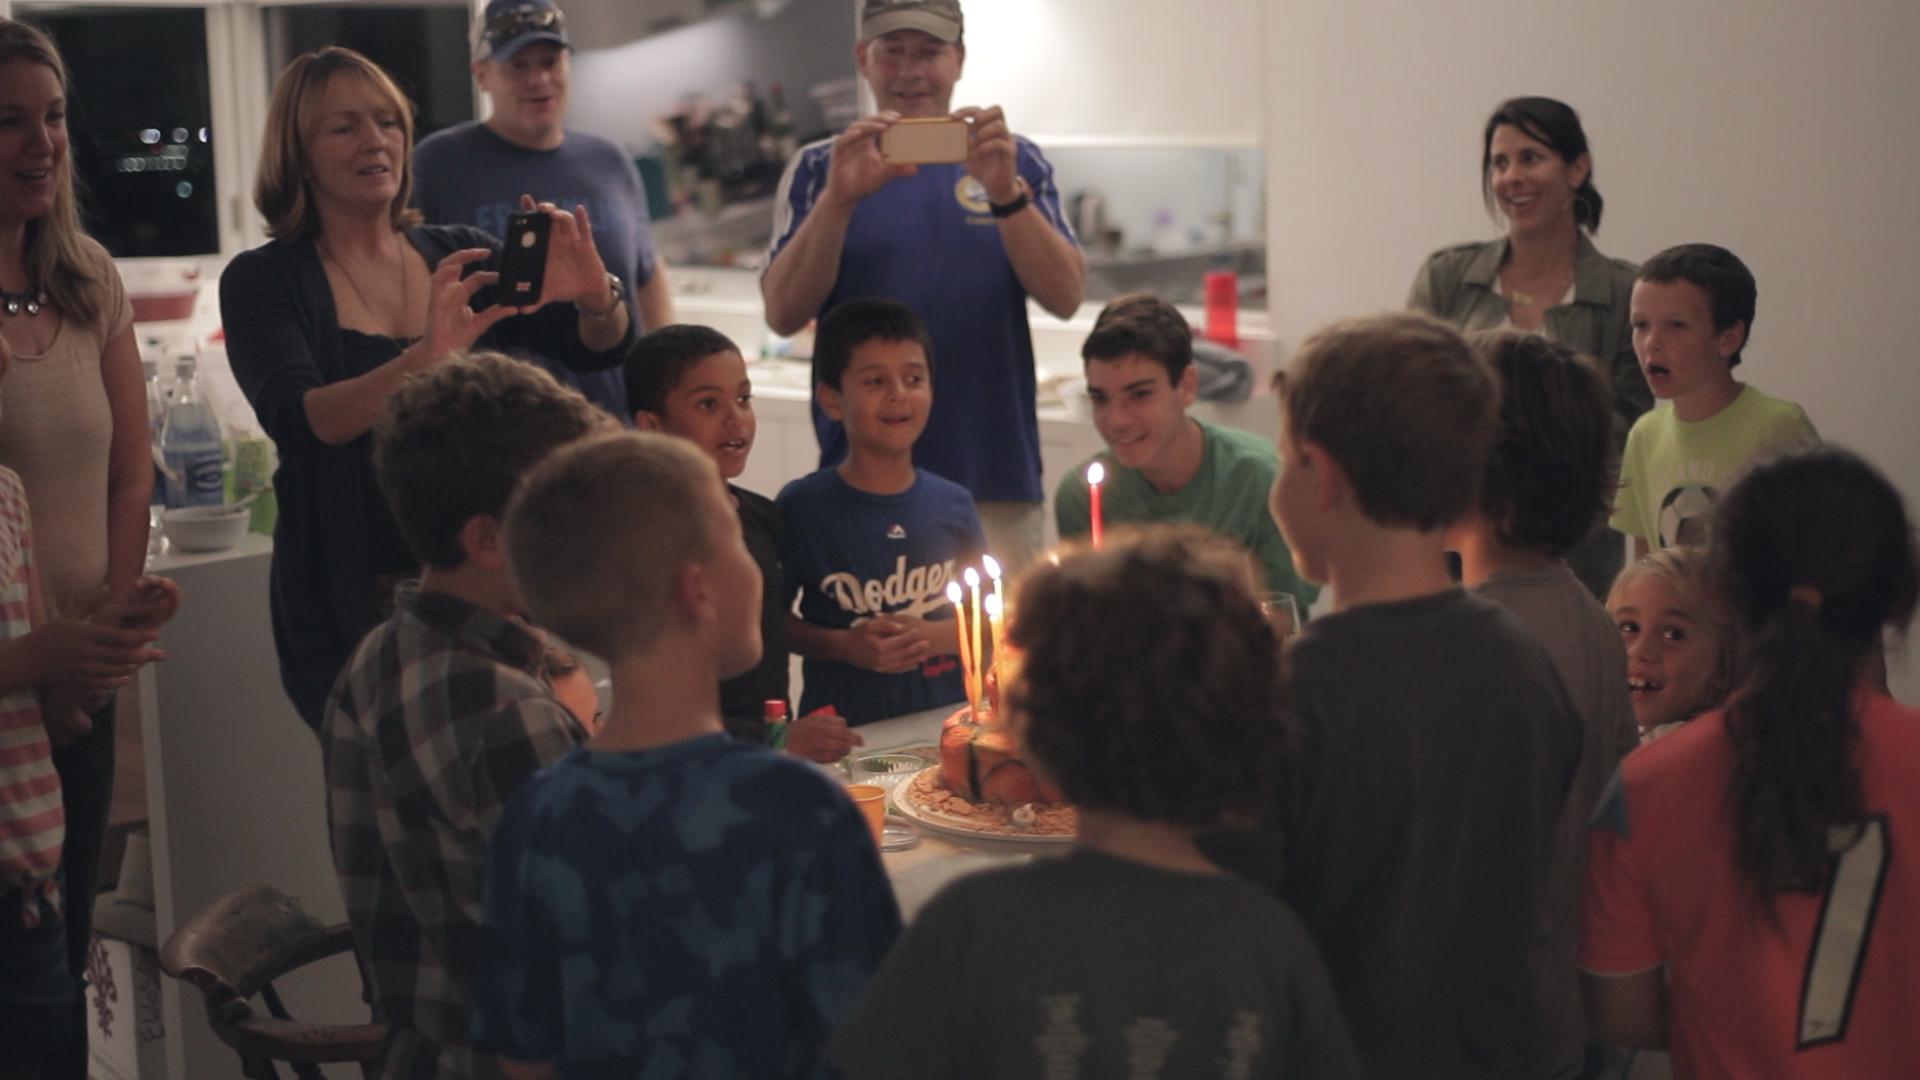 woodwalk-communigift-los angeles-birthday-boy-cake-candle-family-friends